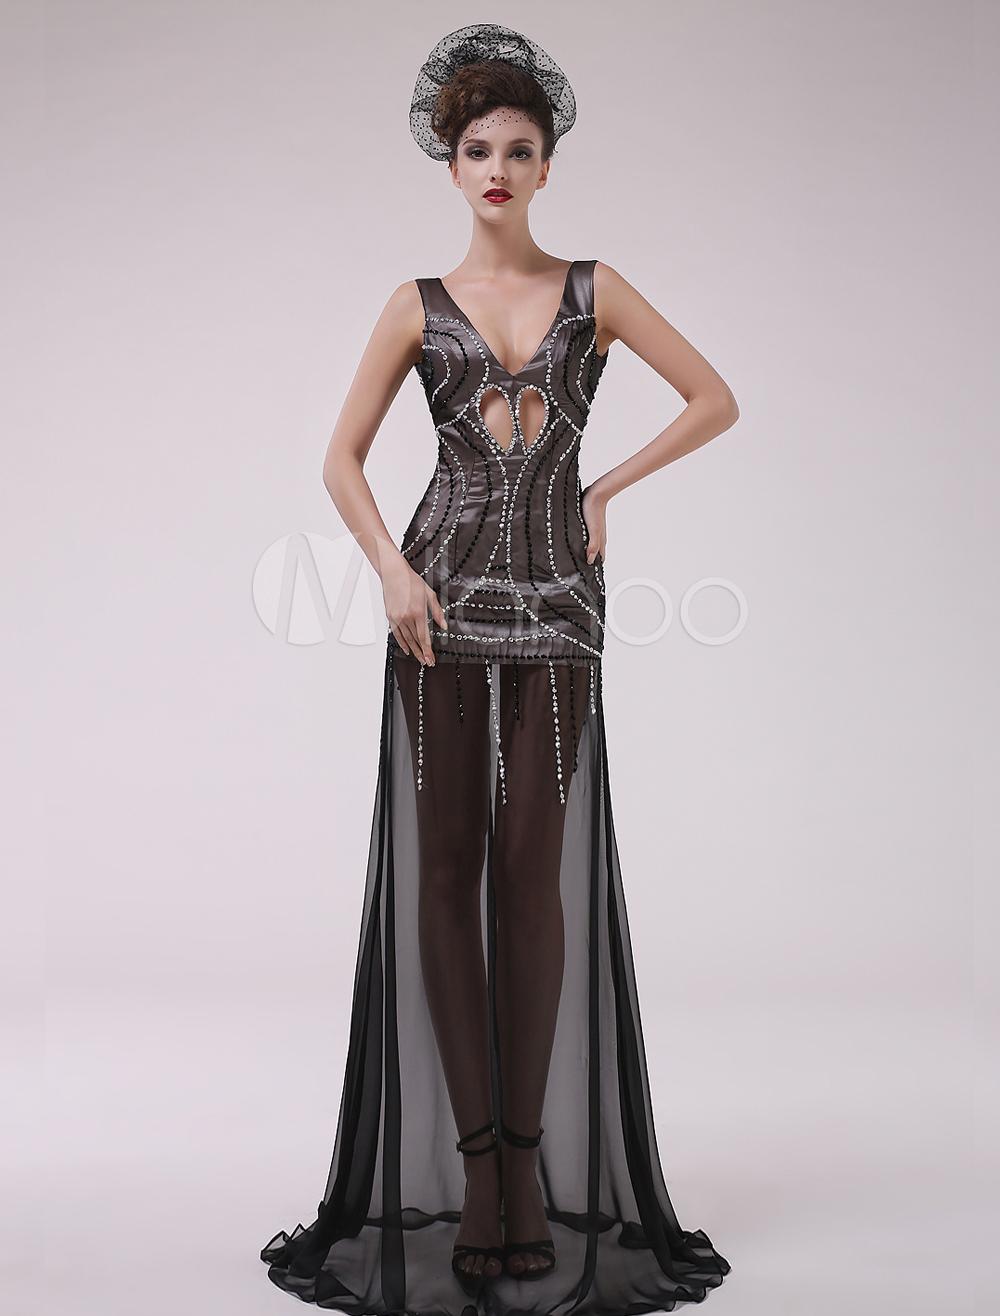 Buy Black Beading V-Neck A-line Chiffon Charming Evening Dress Milanoo for $141.29 in Milanoo store